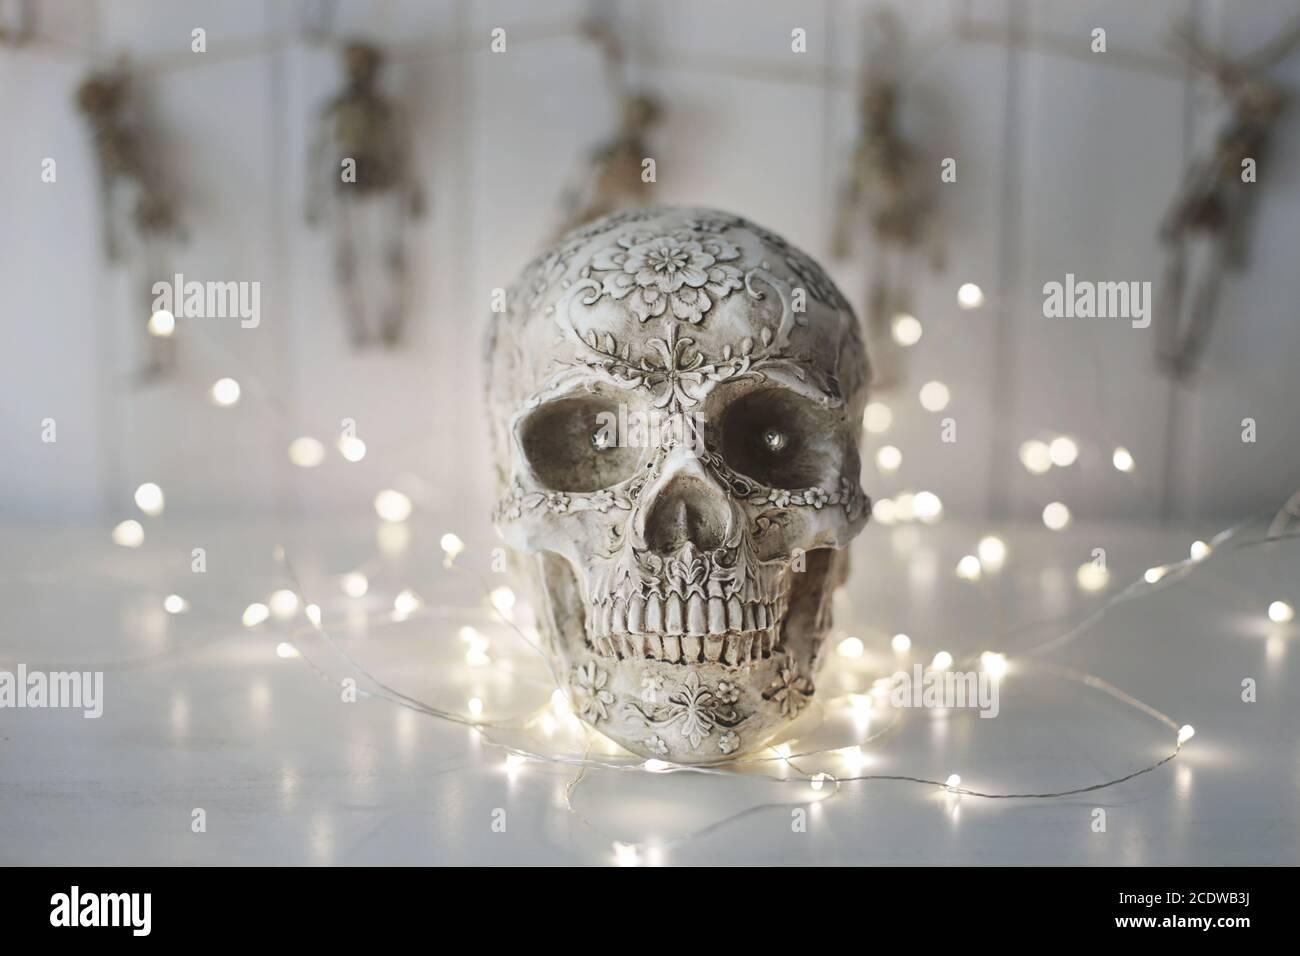 Cráneo de miedo con luces de fondo Foto de stock